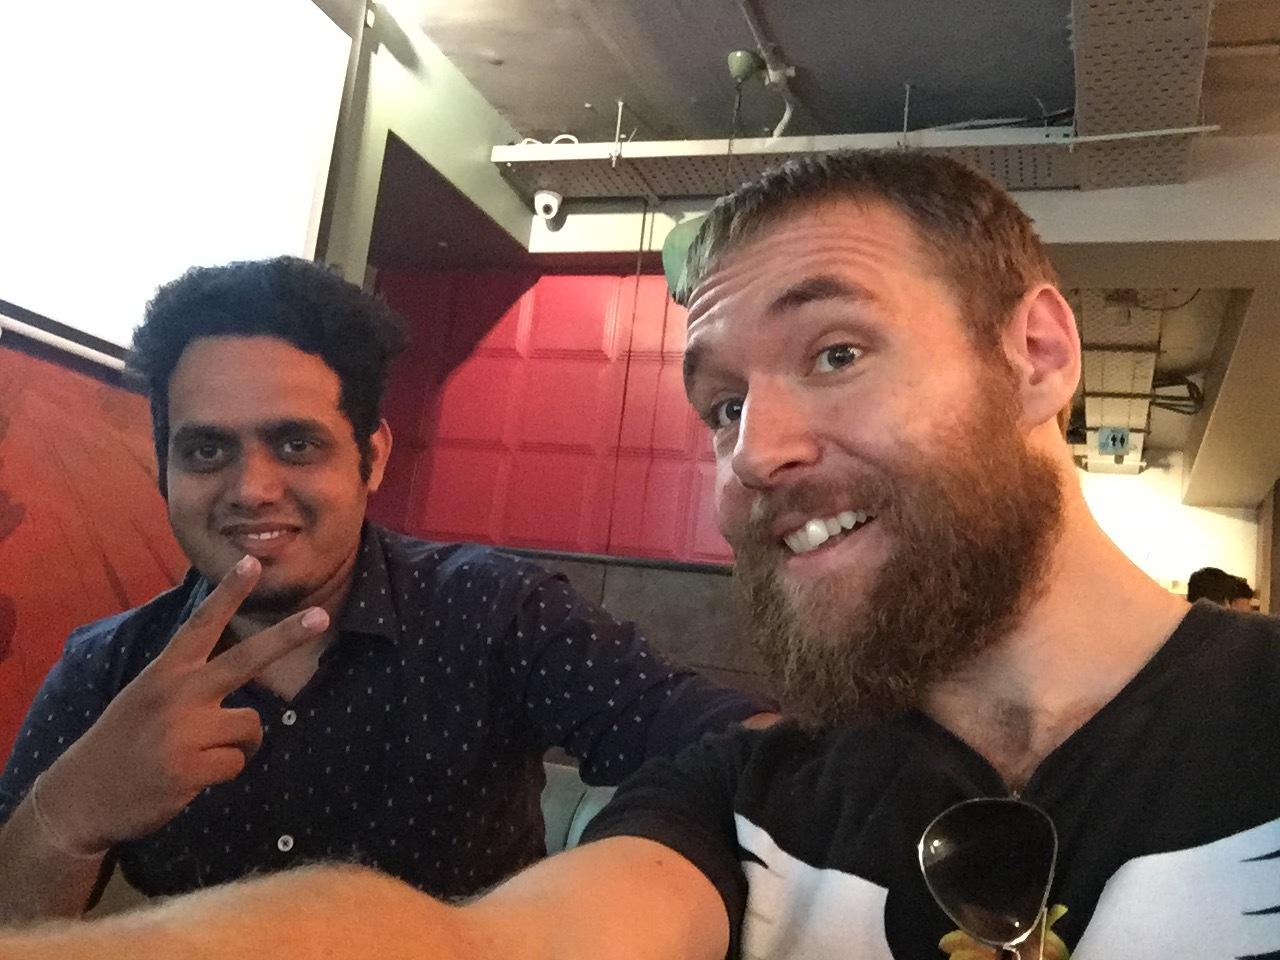 Prithviraj and I at a Café in Bangalore, India